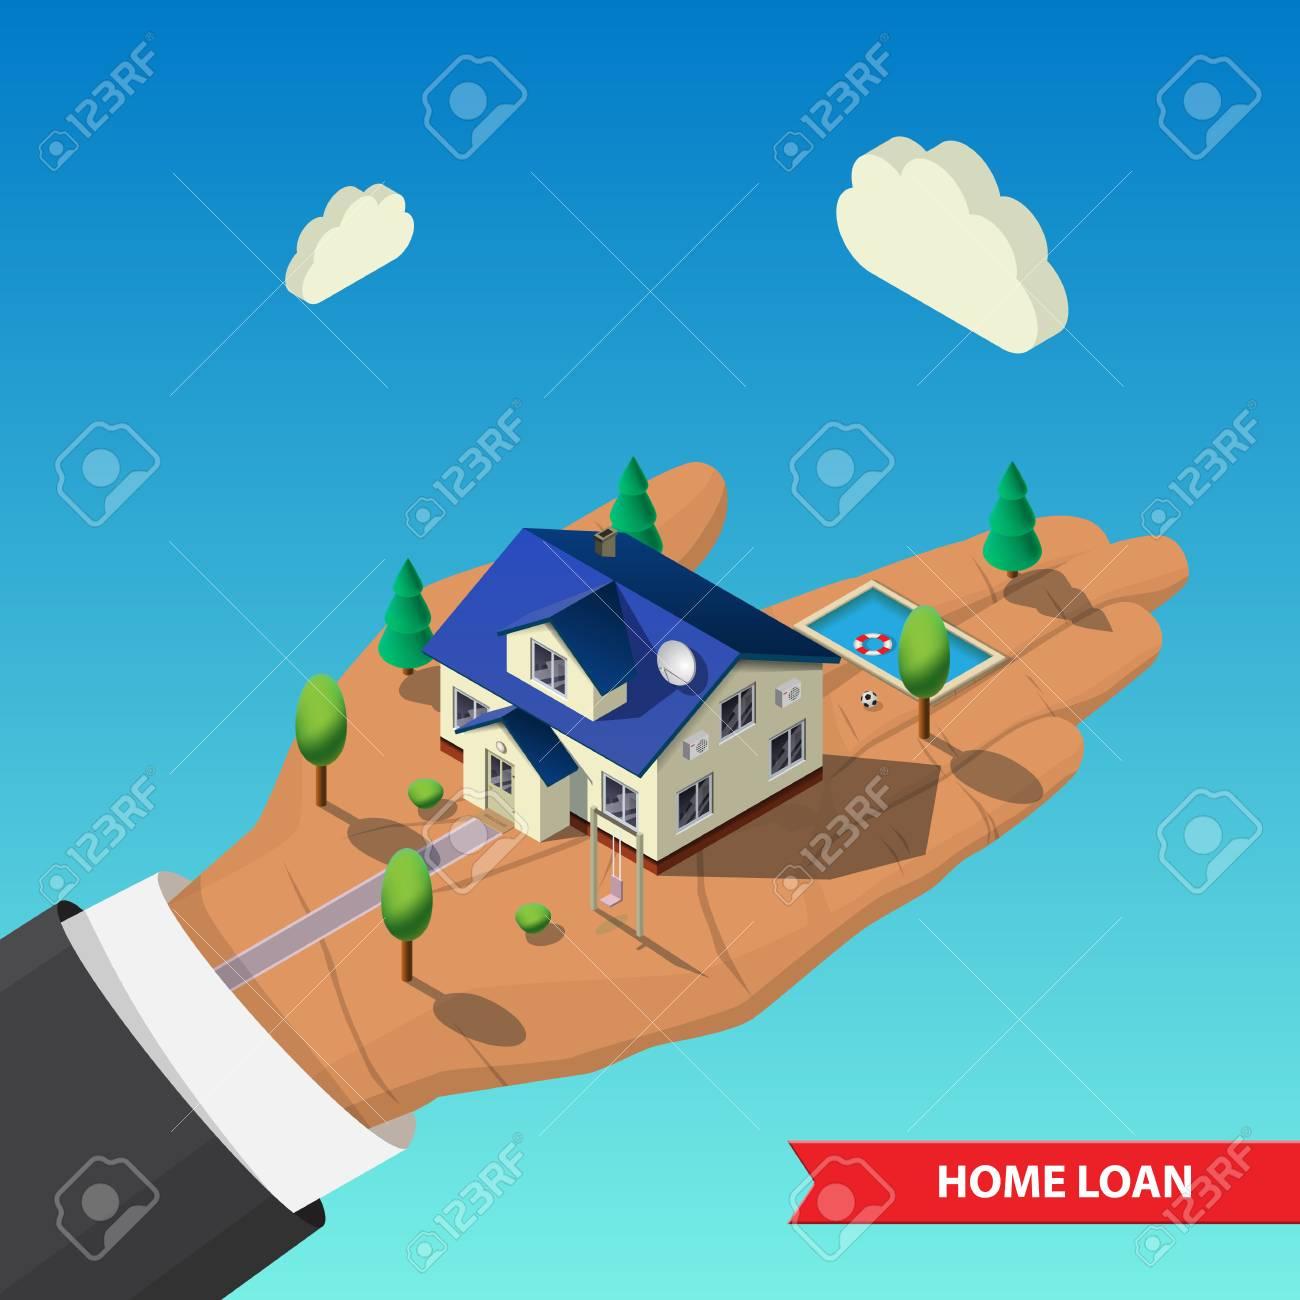 Flat 3d isometric. big hand holds a house, trees, swimming pool...